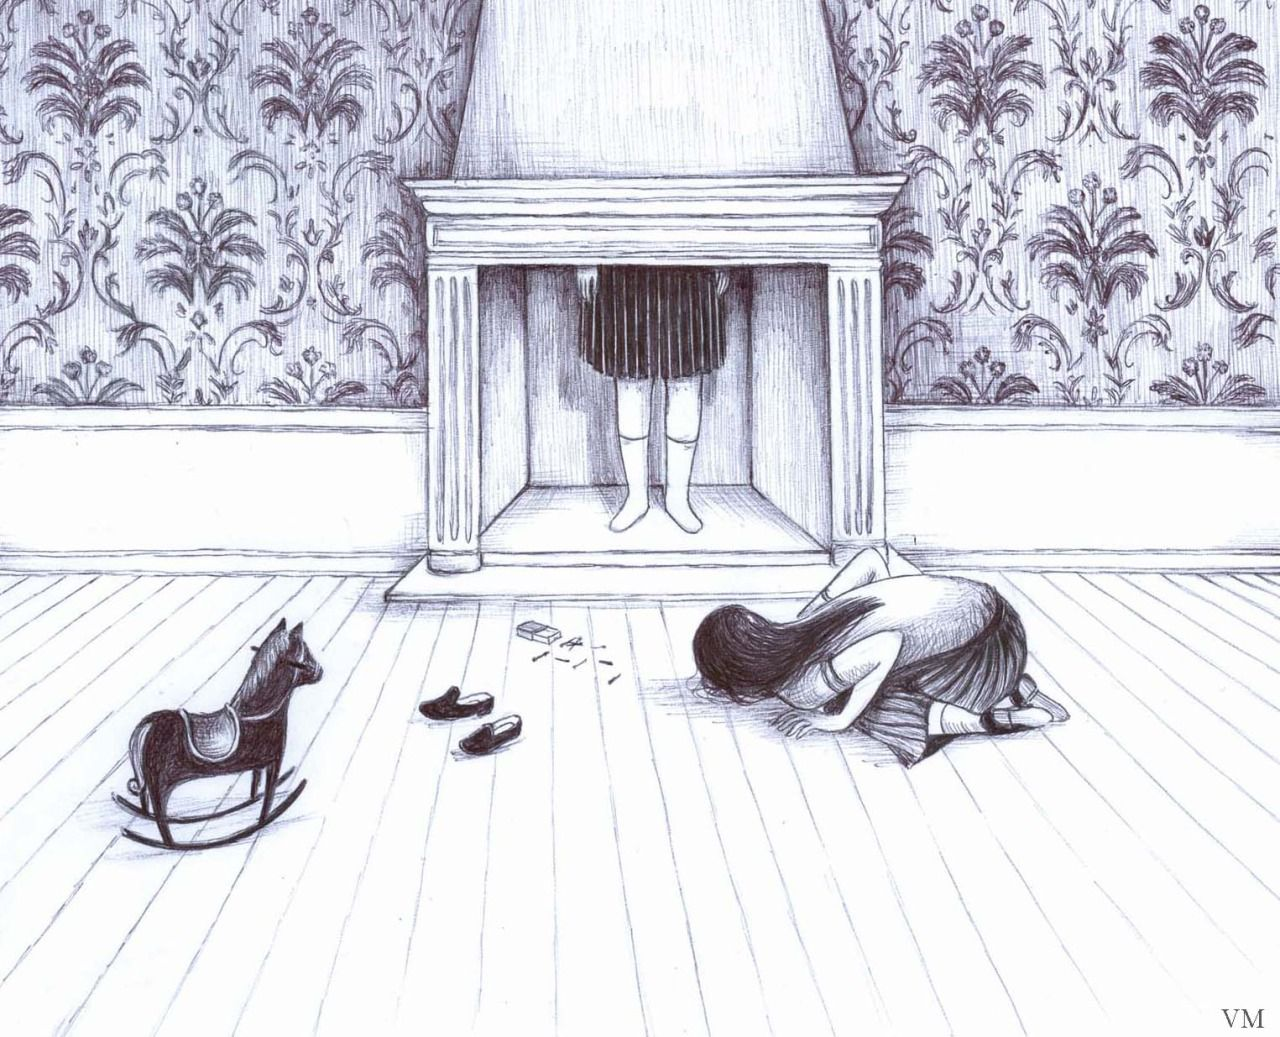 virginia mori illustration 3